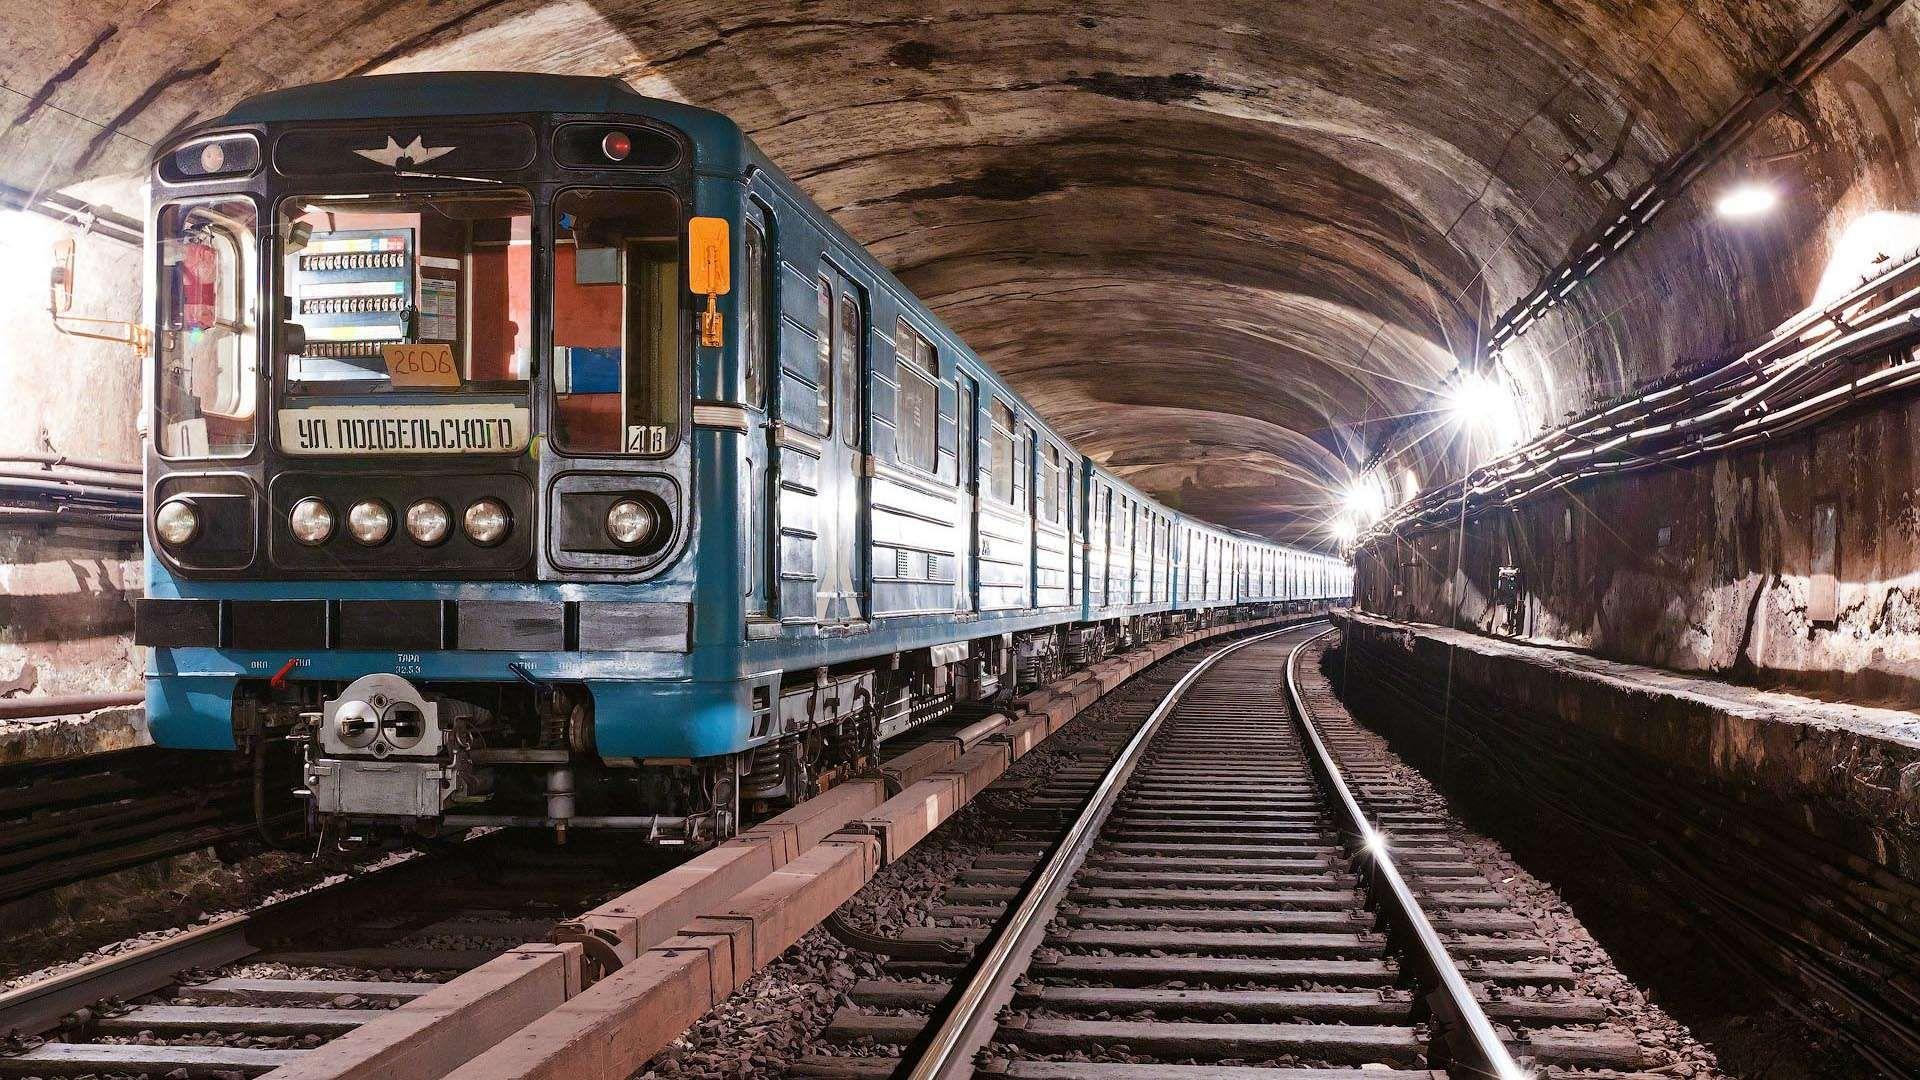 Nyc Subway Wallpaper Design Ideas Subway Wallpaper New York Train Wallpaper Train Moscow Metro